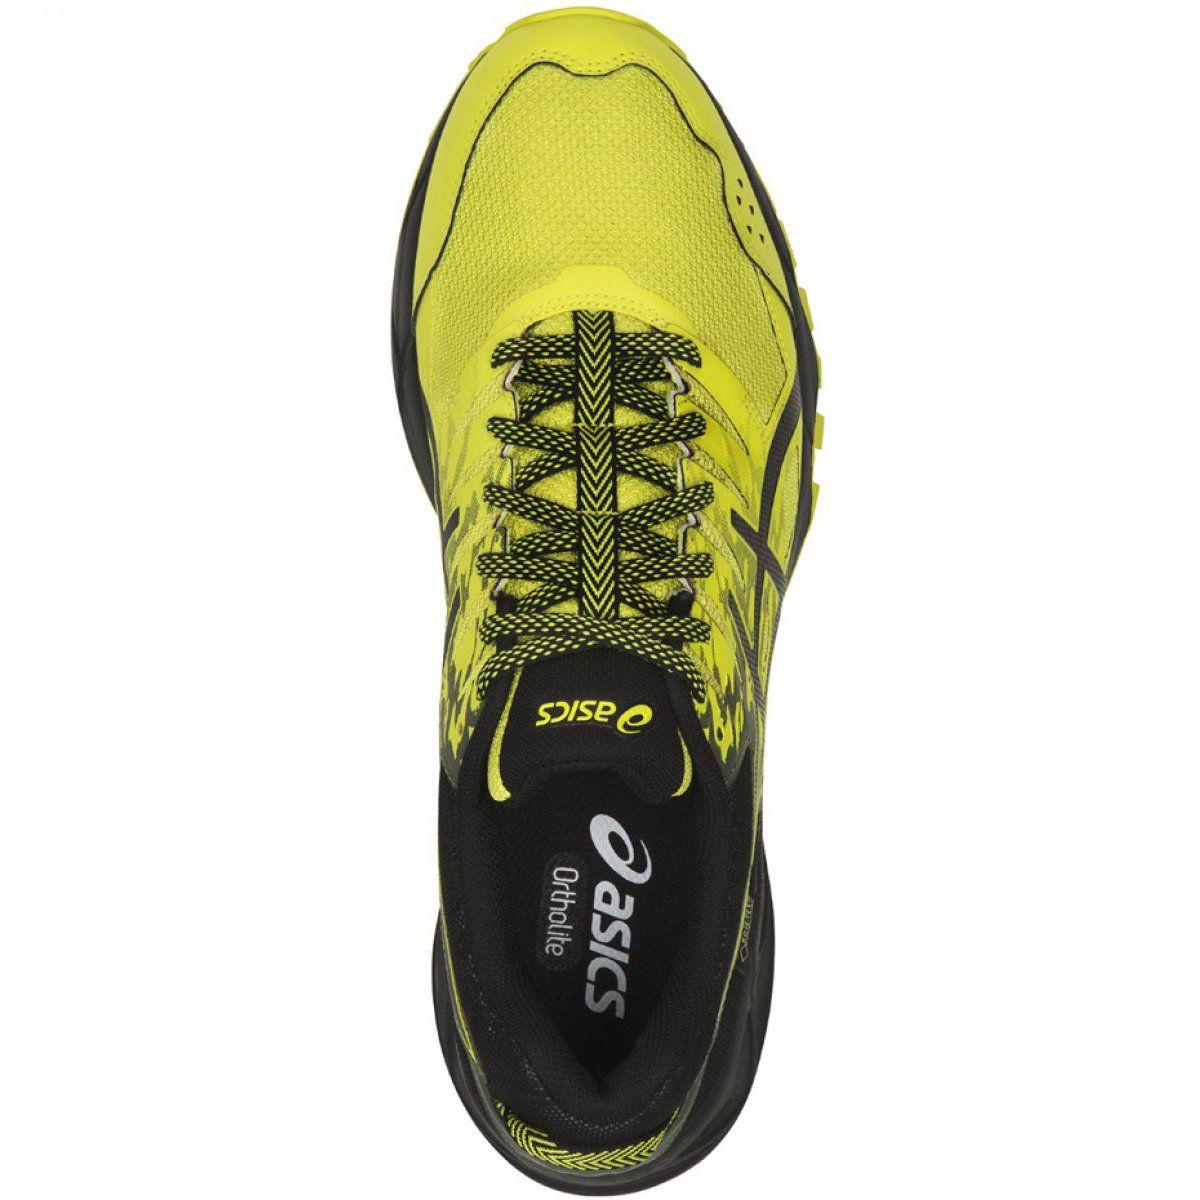 Buty Do Biegania Asics Gel Sonoma 3 M Gtx T727n 8990 Czarne Zolte Running Shoes Running Shoes For Men Black Running Shoes